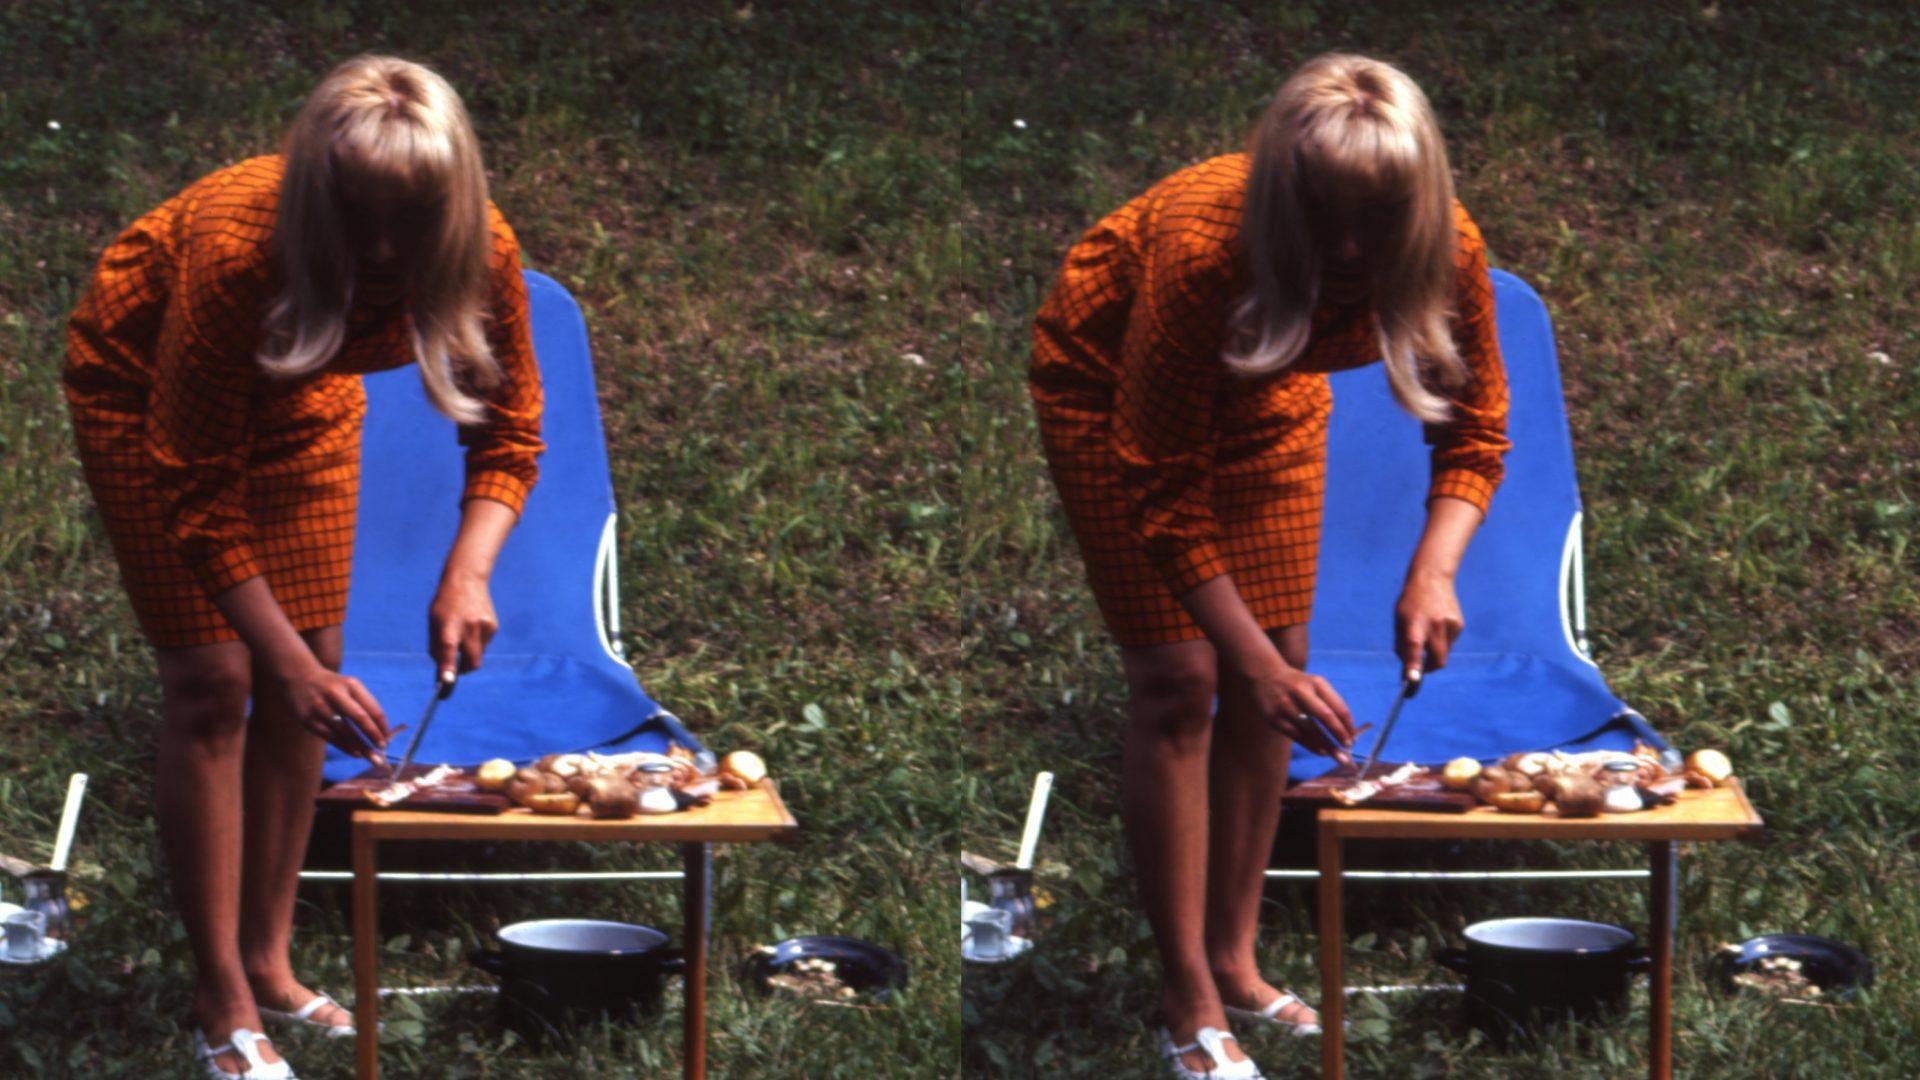 Fotografie Michael Penck, circa 1965, Inv Nr. Dp 069.005, Copyright HfG-Archiv / Museum Ulm